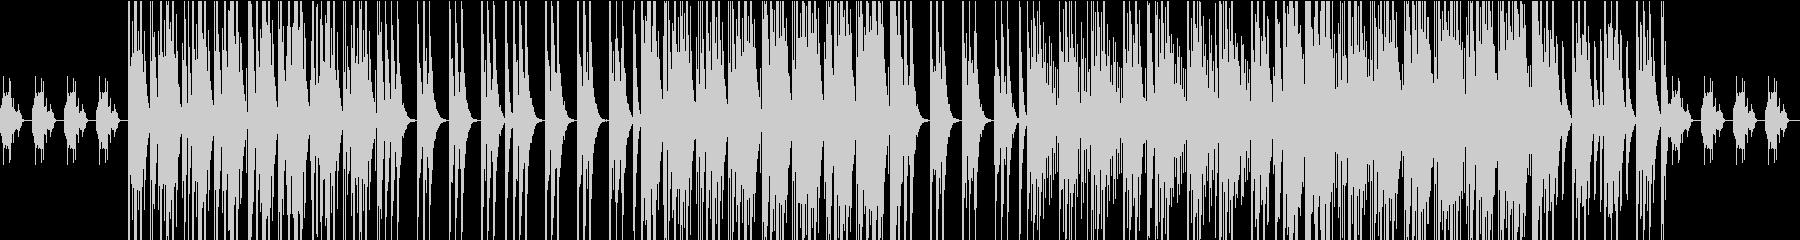 LowSampling Chilloutの未再生の波形